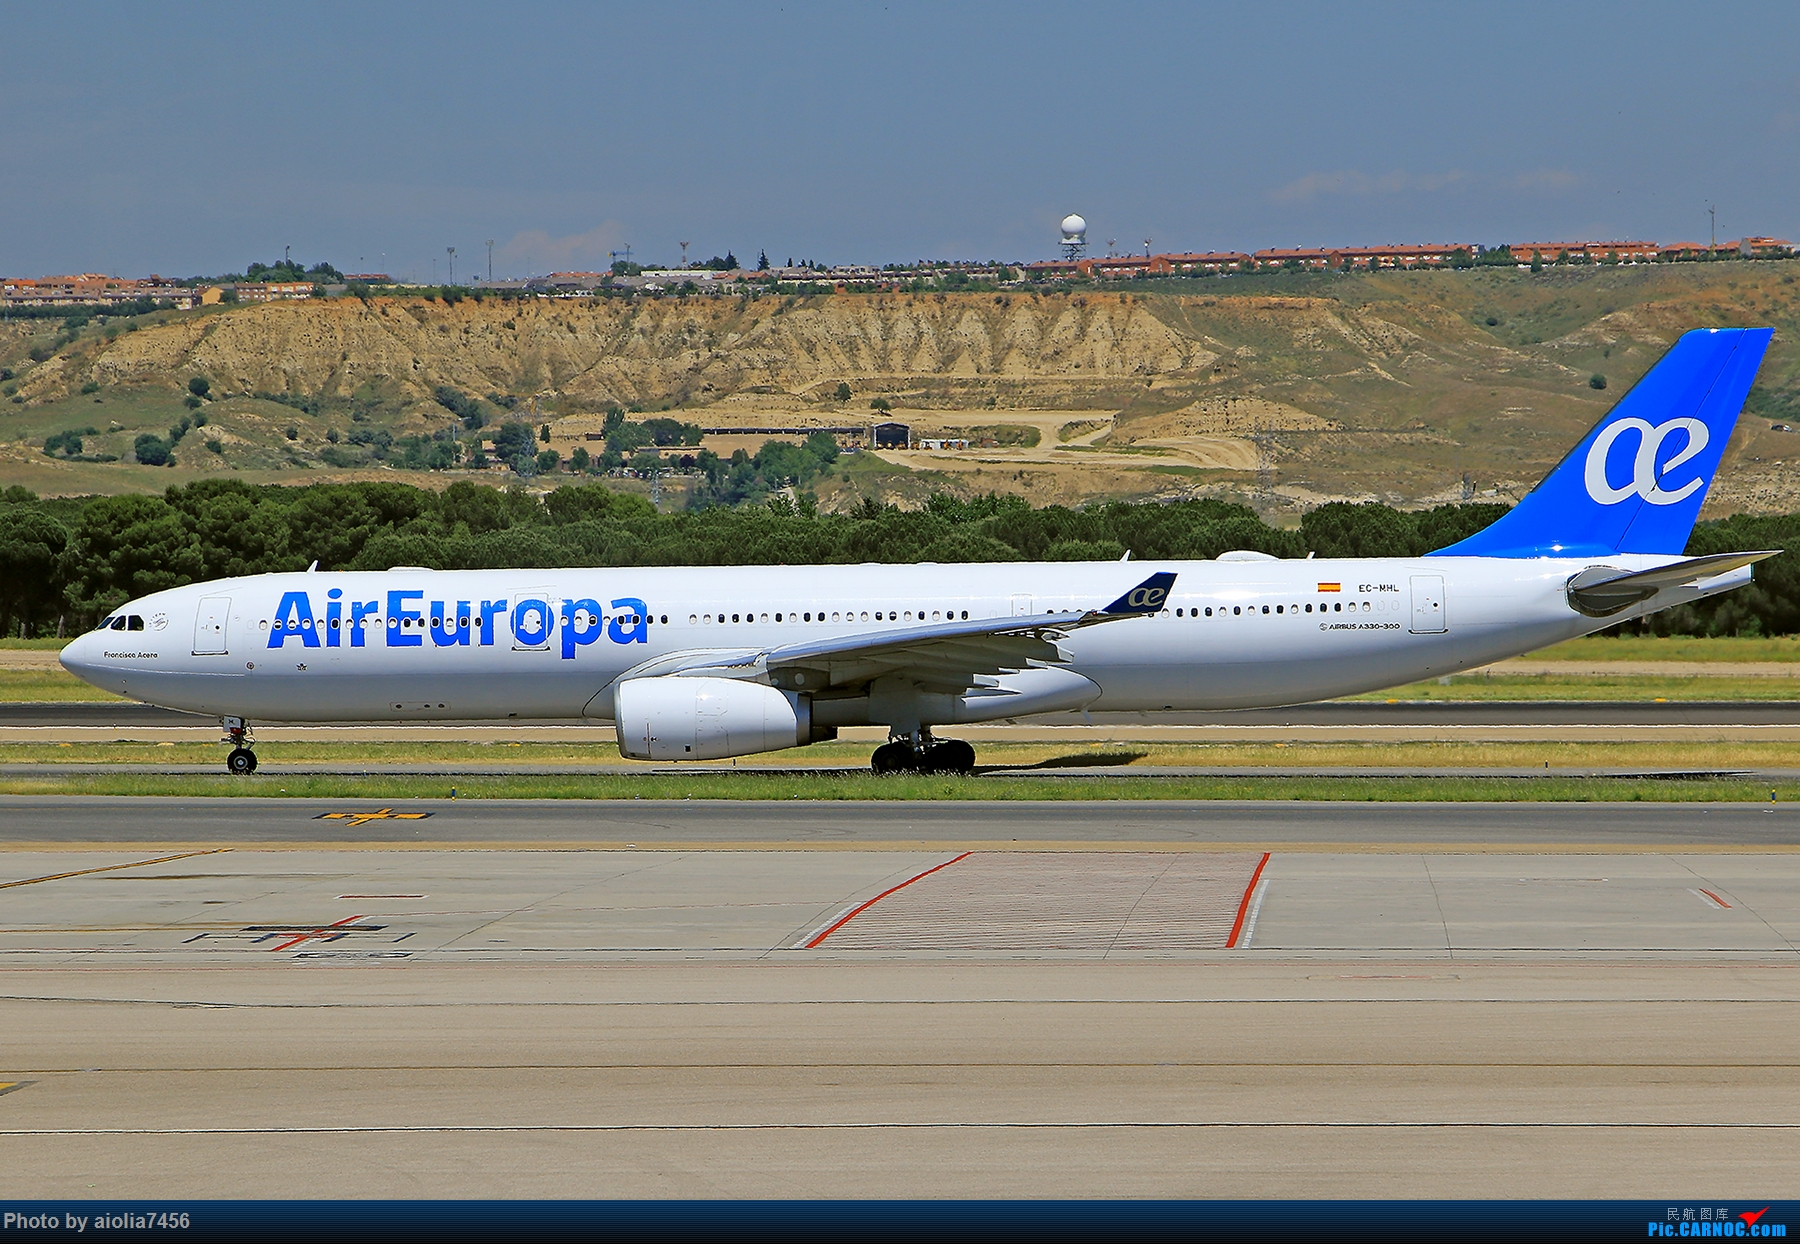 Re:[原创]【合肥飞友会】西行归来第二弹--西行拍机 AIRBUS A330-300 EC-MHL 西班牙马德里机场